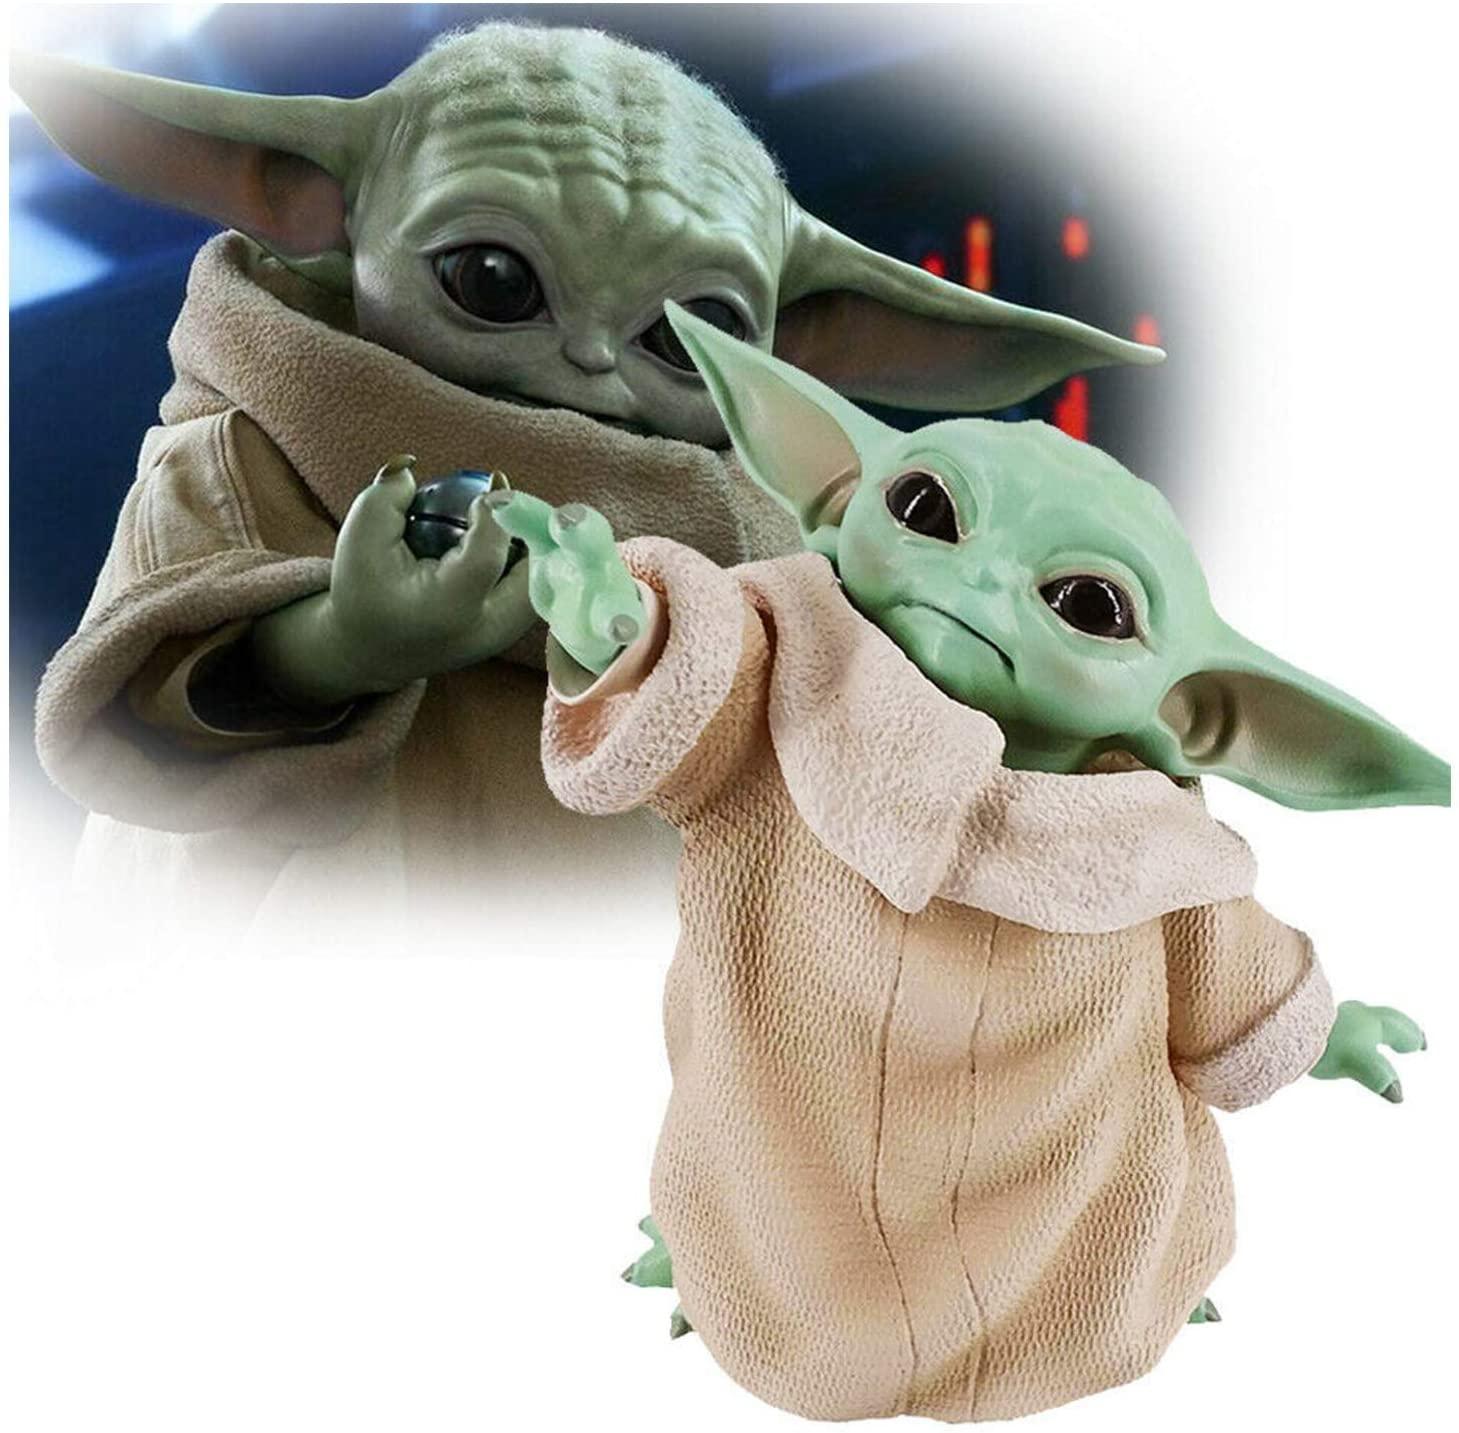 HAGENGOO Star Wars The Child Animatronic Edition Mandalorian Baby Yoda